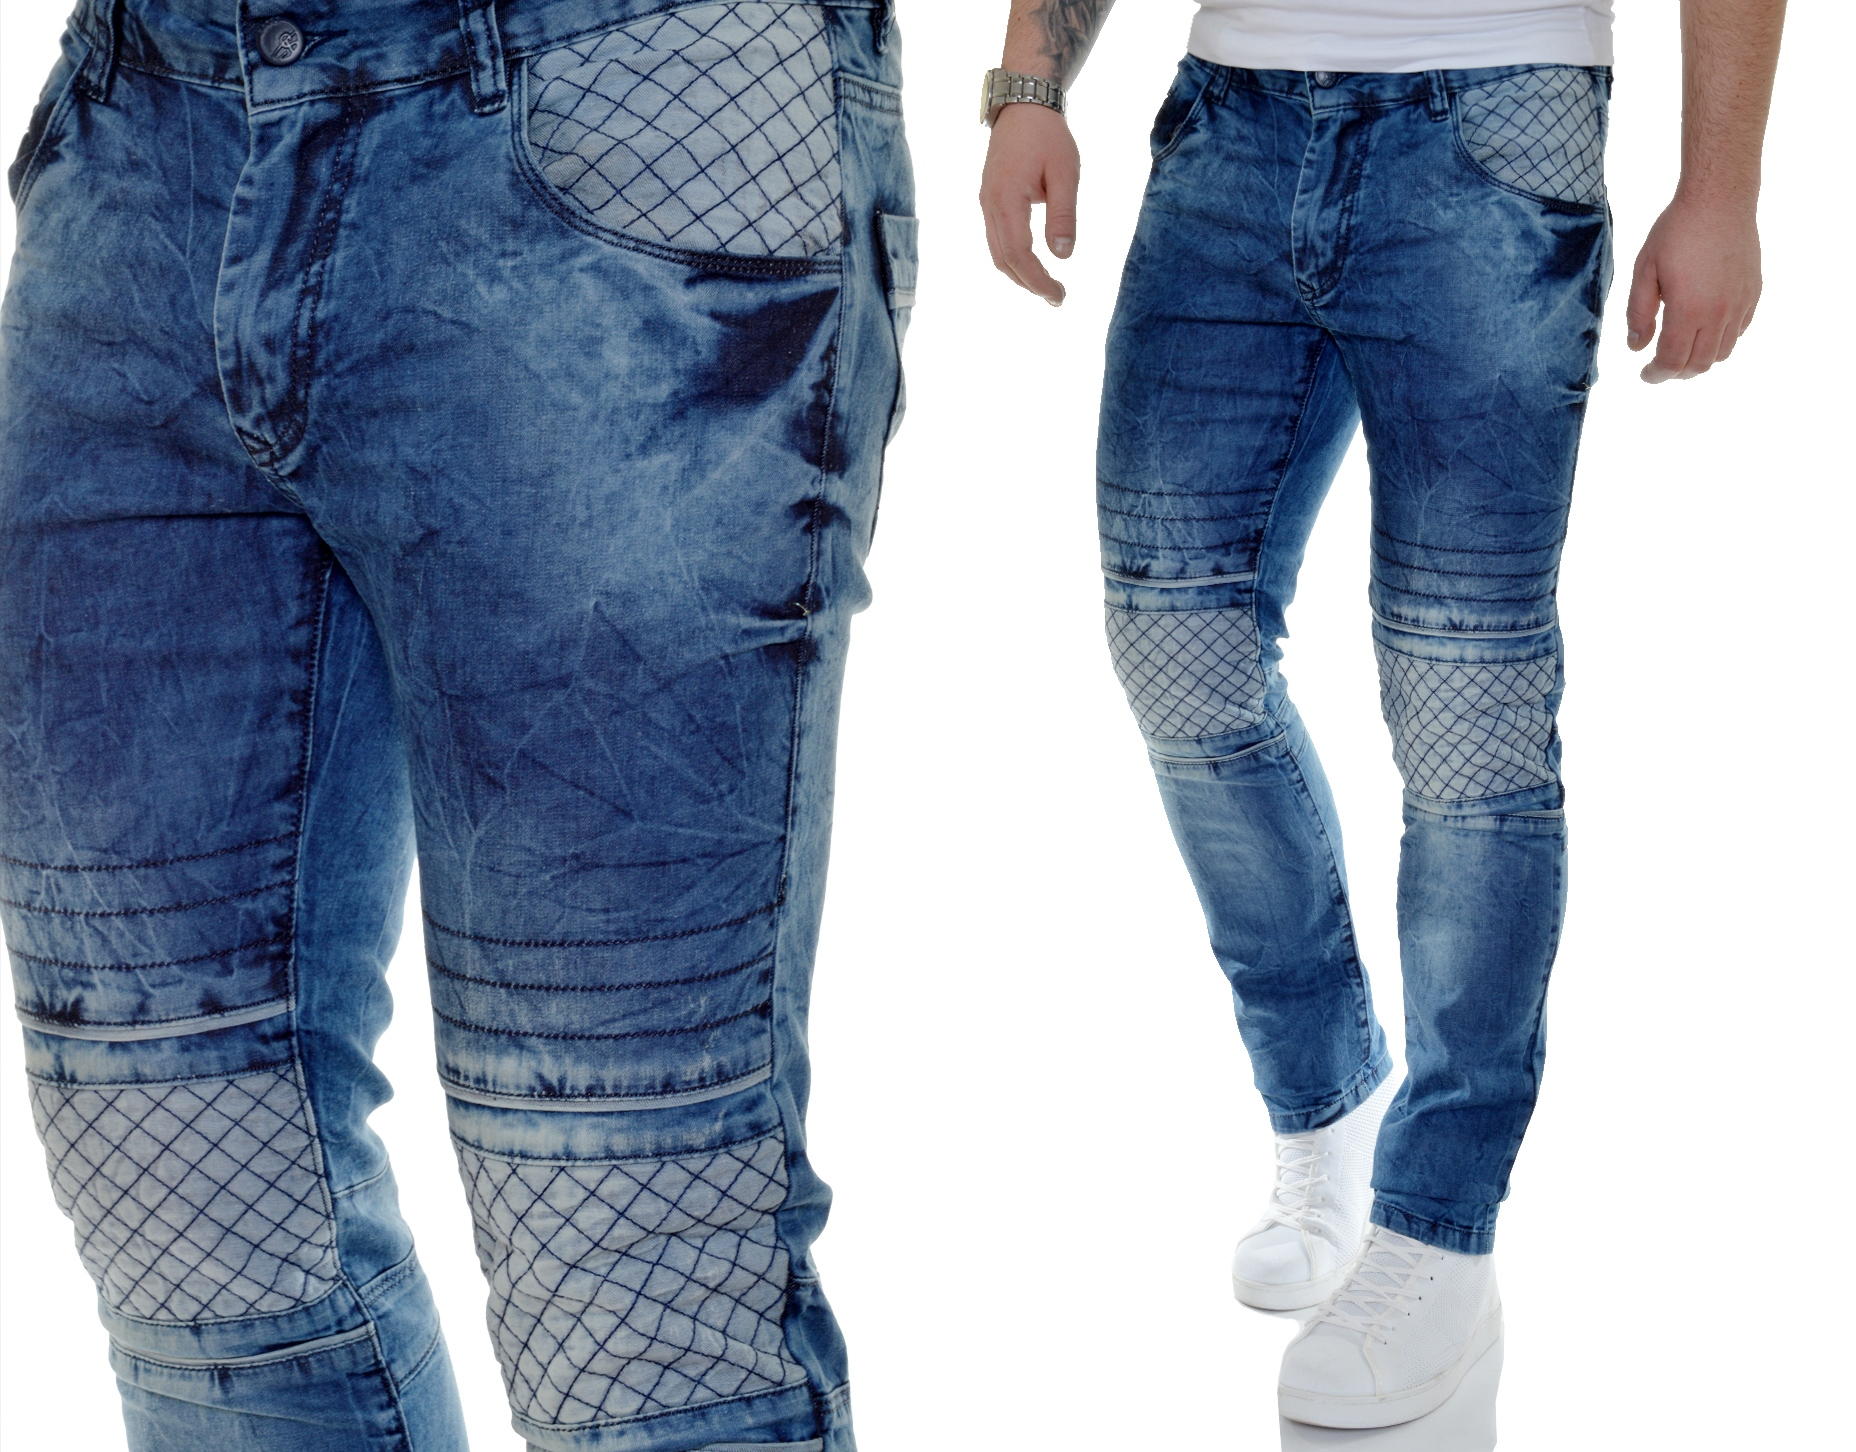 Spodnie Męskie Jeansy na Lato Mondo Przecierane